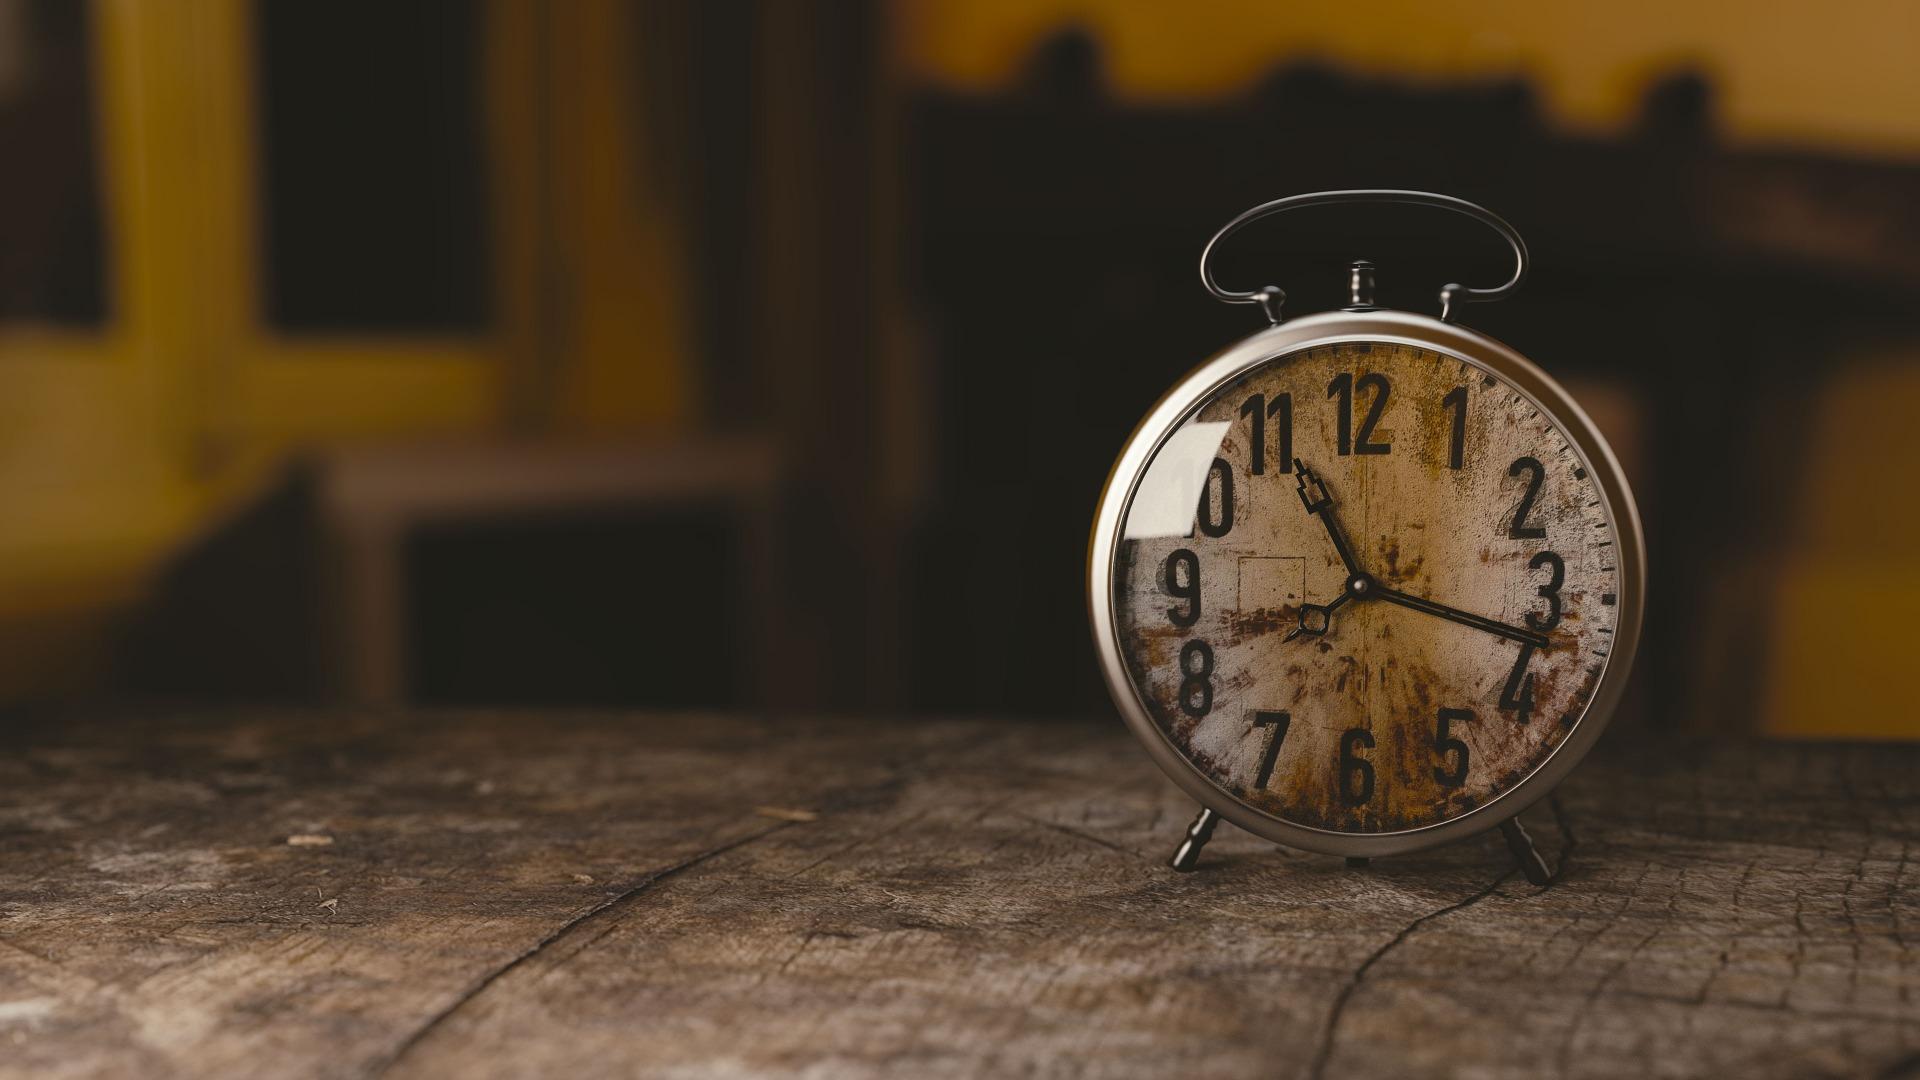 Relógio, tiempo, relógio desptempodor, hora, vintage - Papéis de parede HD - Professor-falken.com